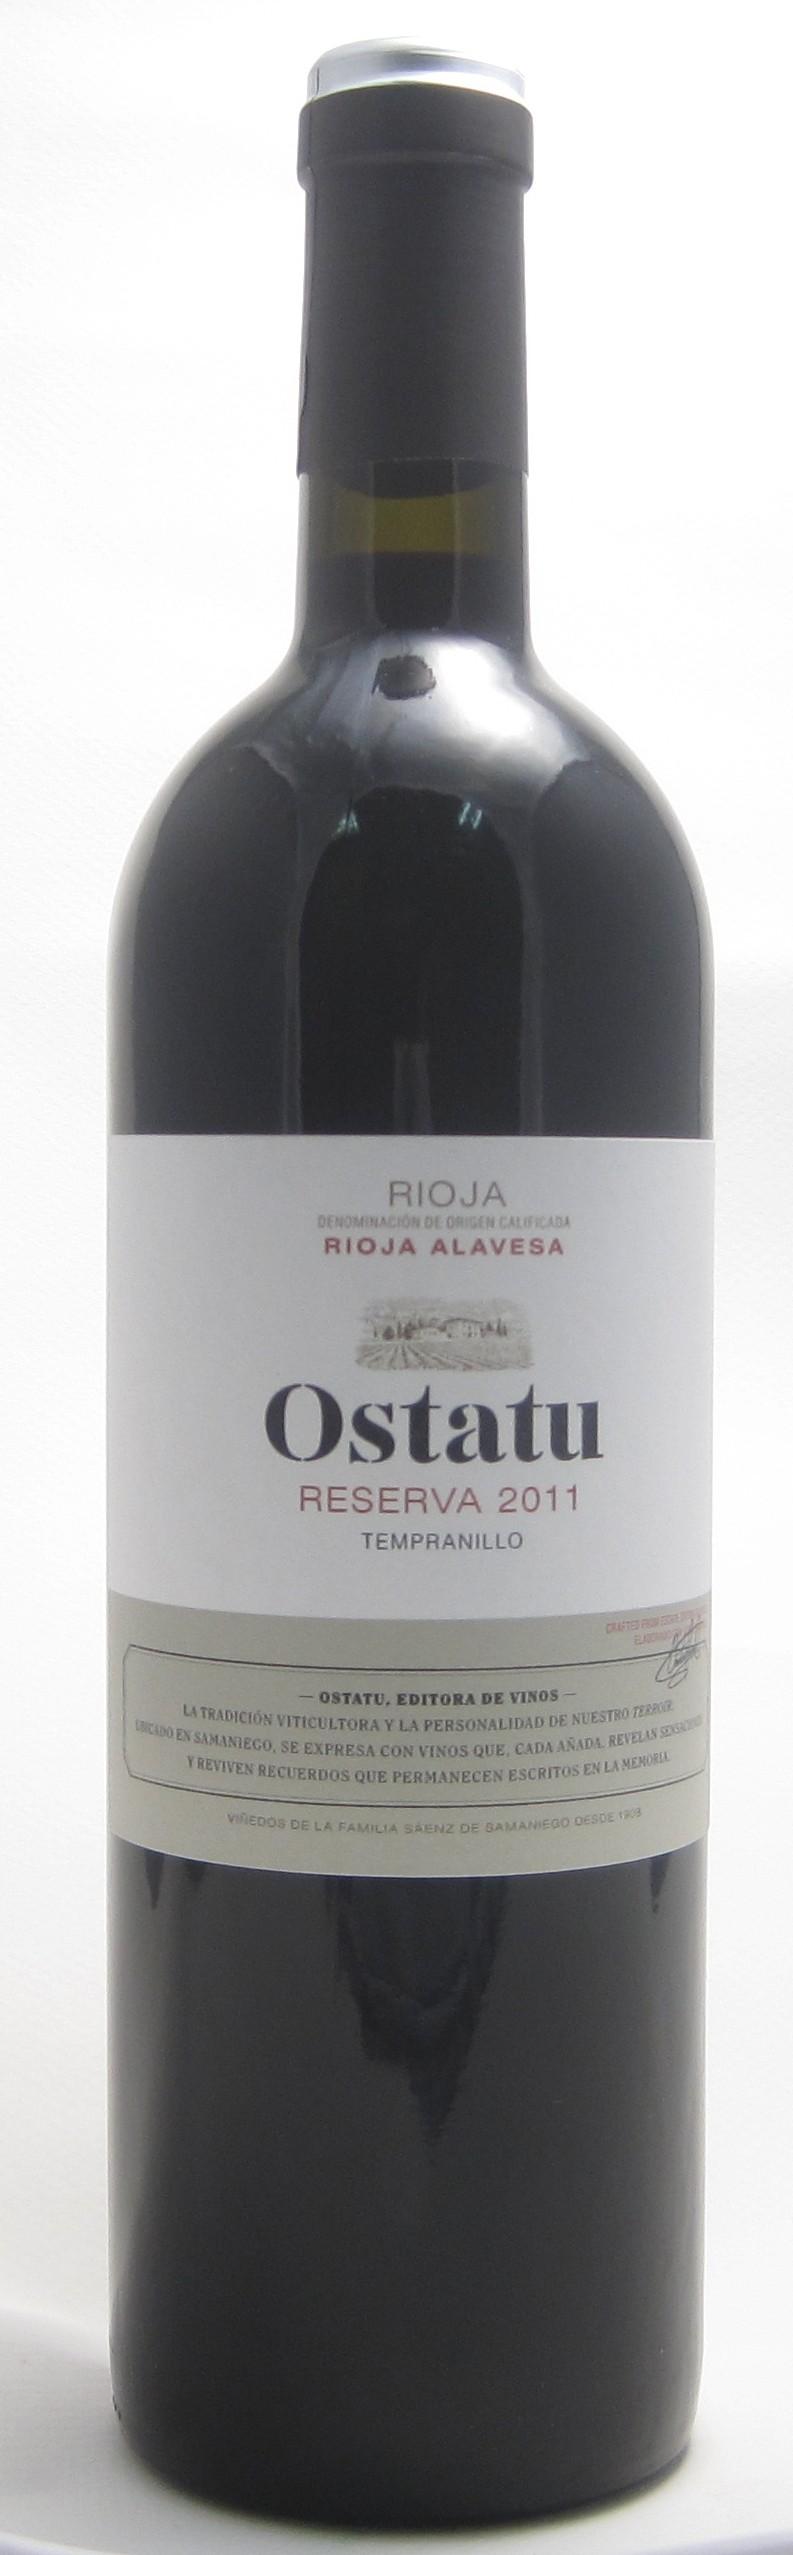 Bodegas Ostatu Rioja Reserva